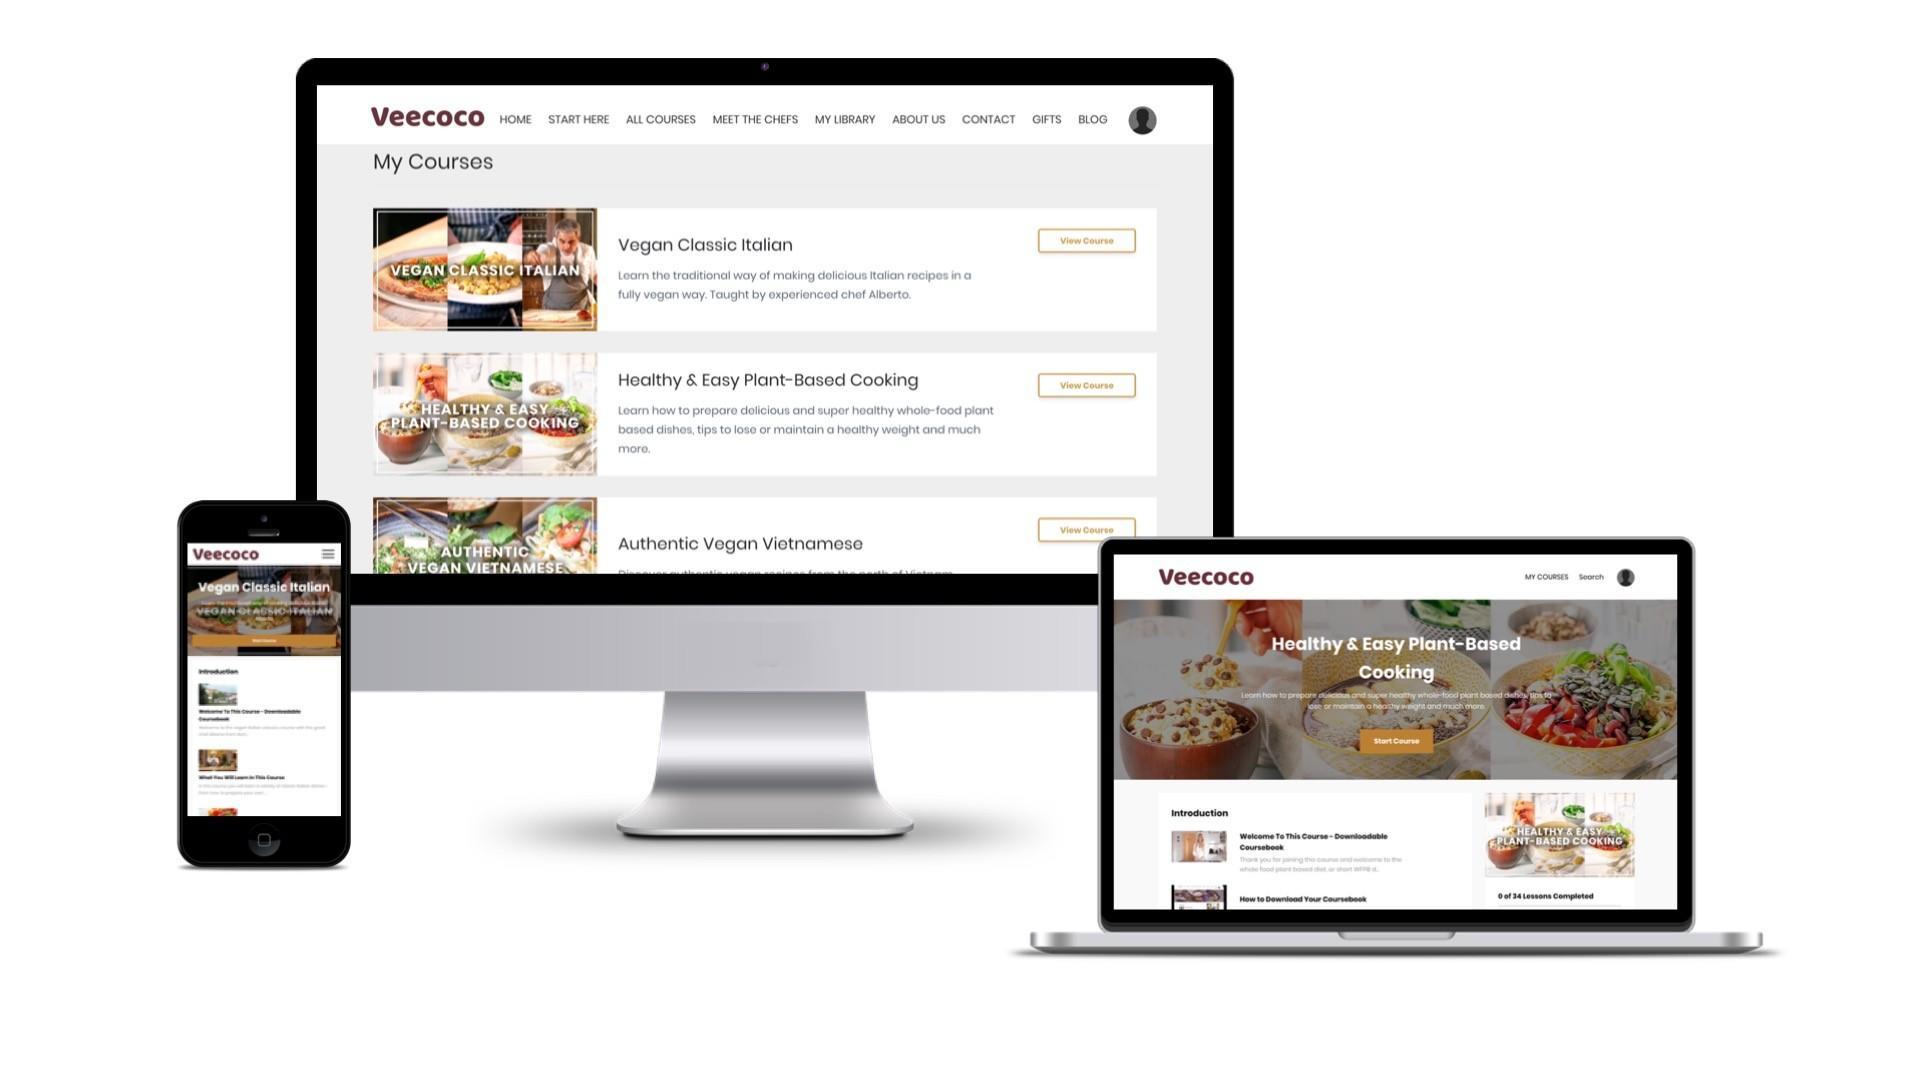 take online vegan cooking classes on computer, laptop, or phone